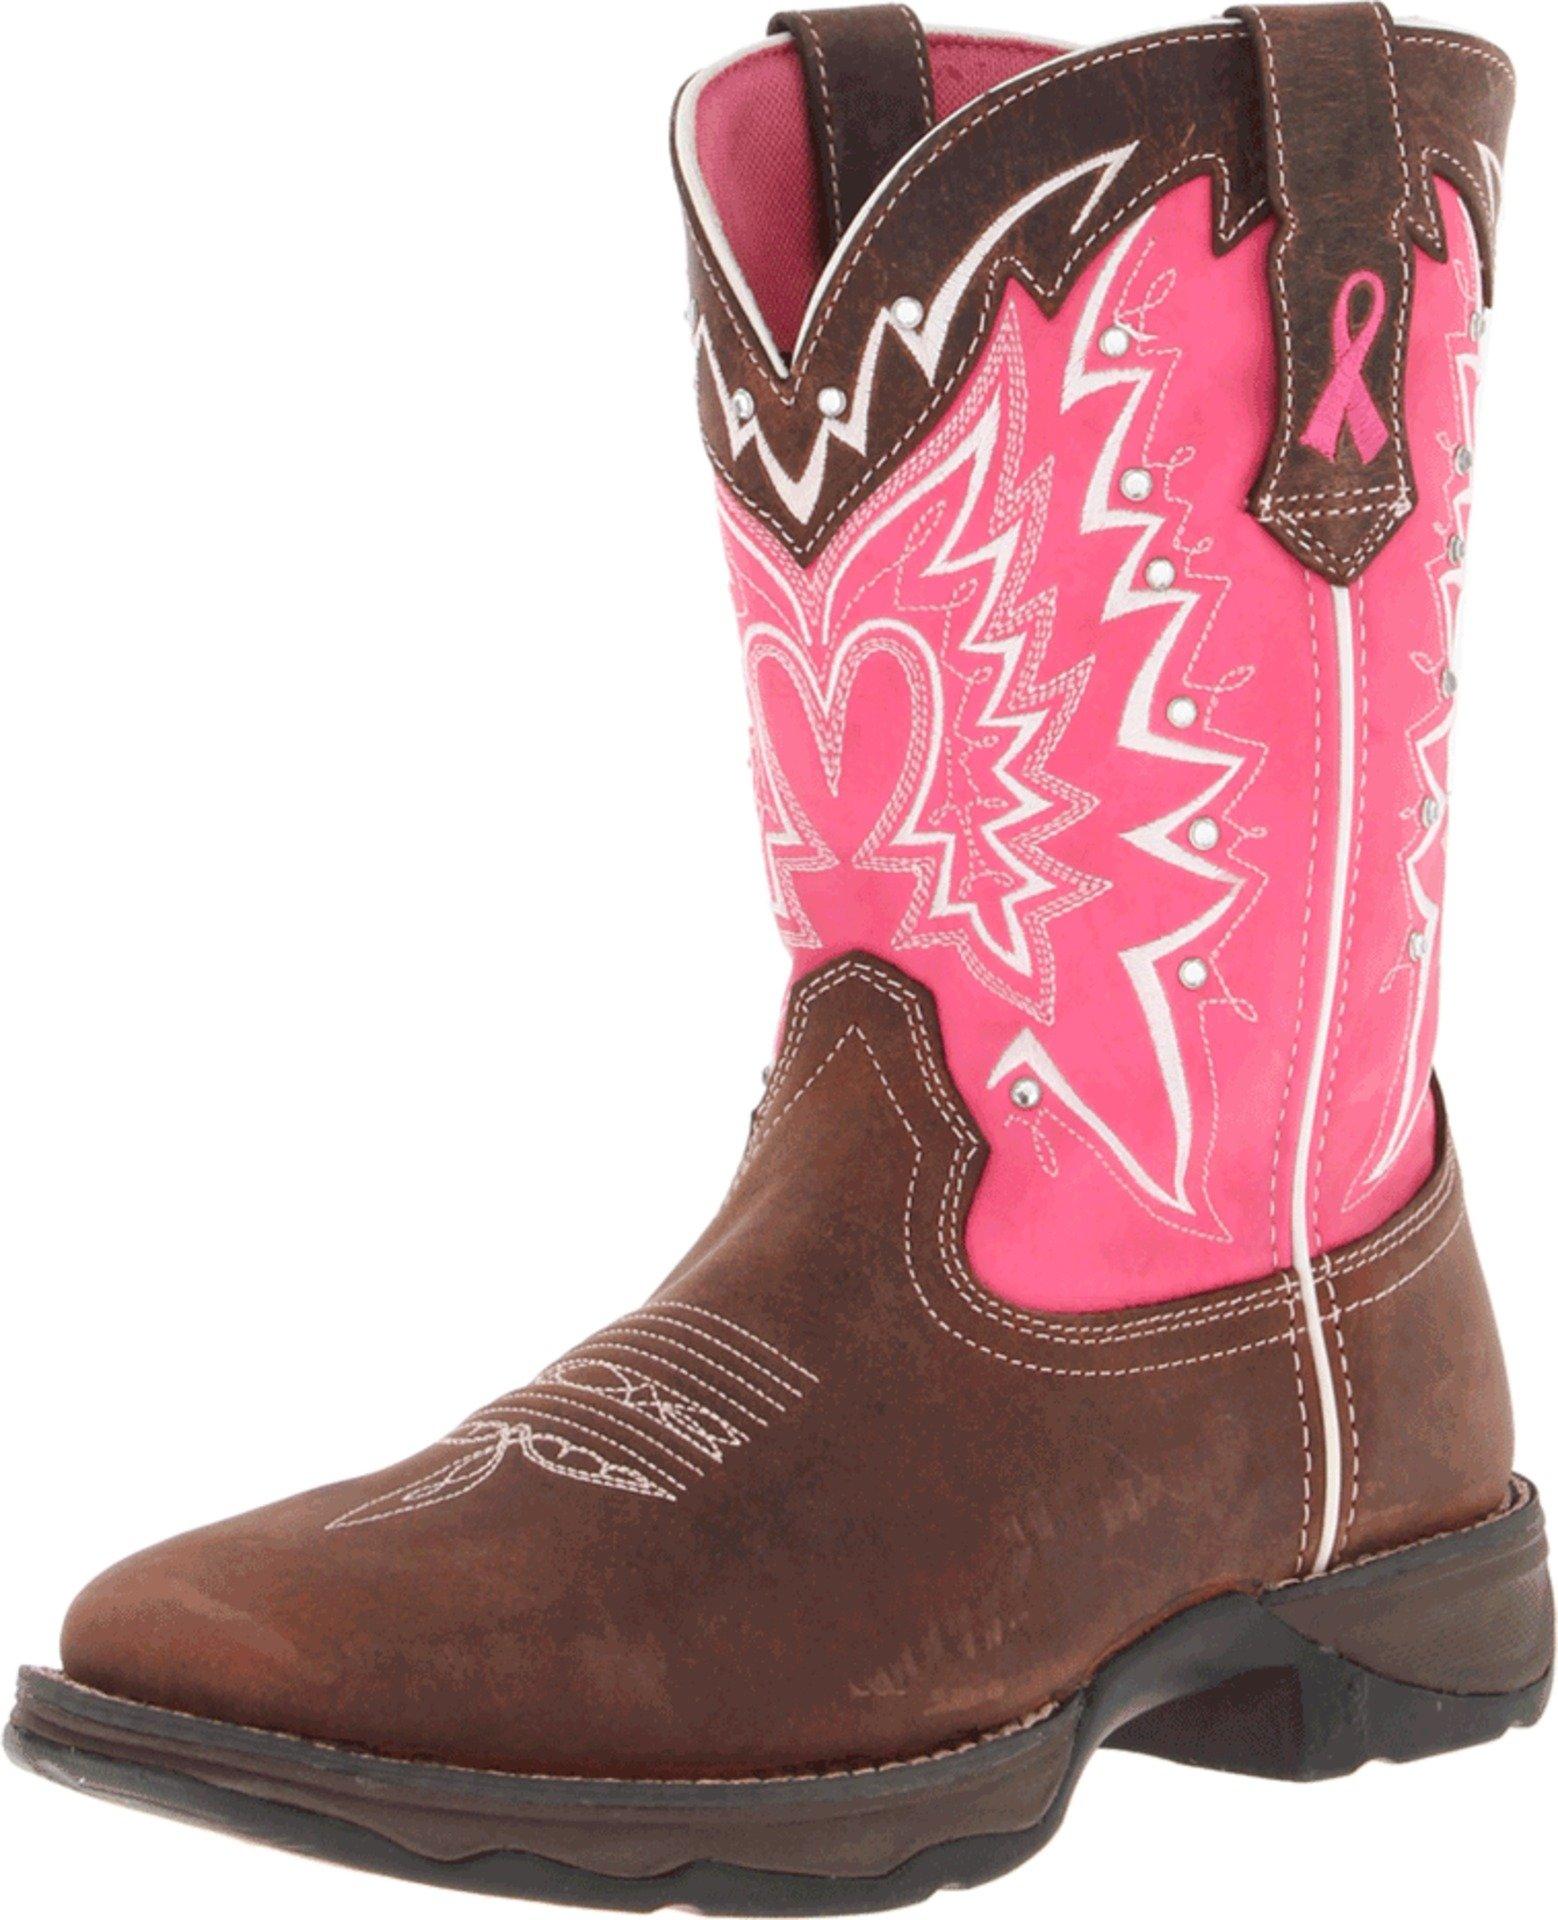 Durango Lady Rebel 10 Inch Pull-on RD3557 Western Boot,Dark Brown/Pink,7.5 M US